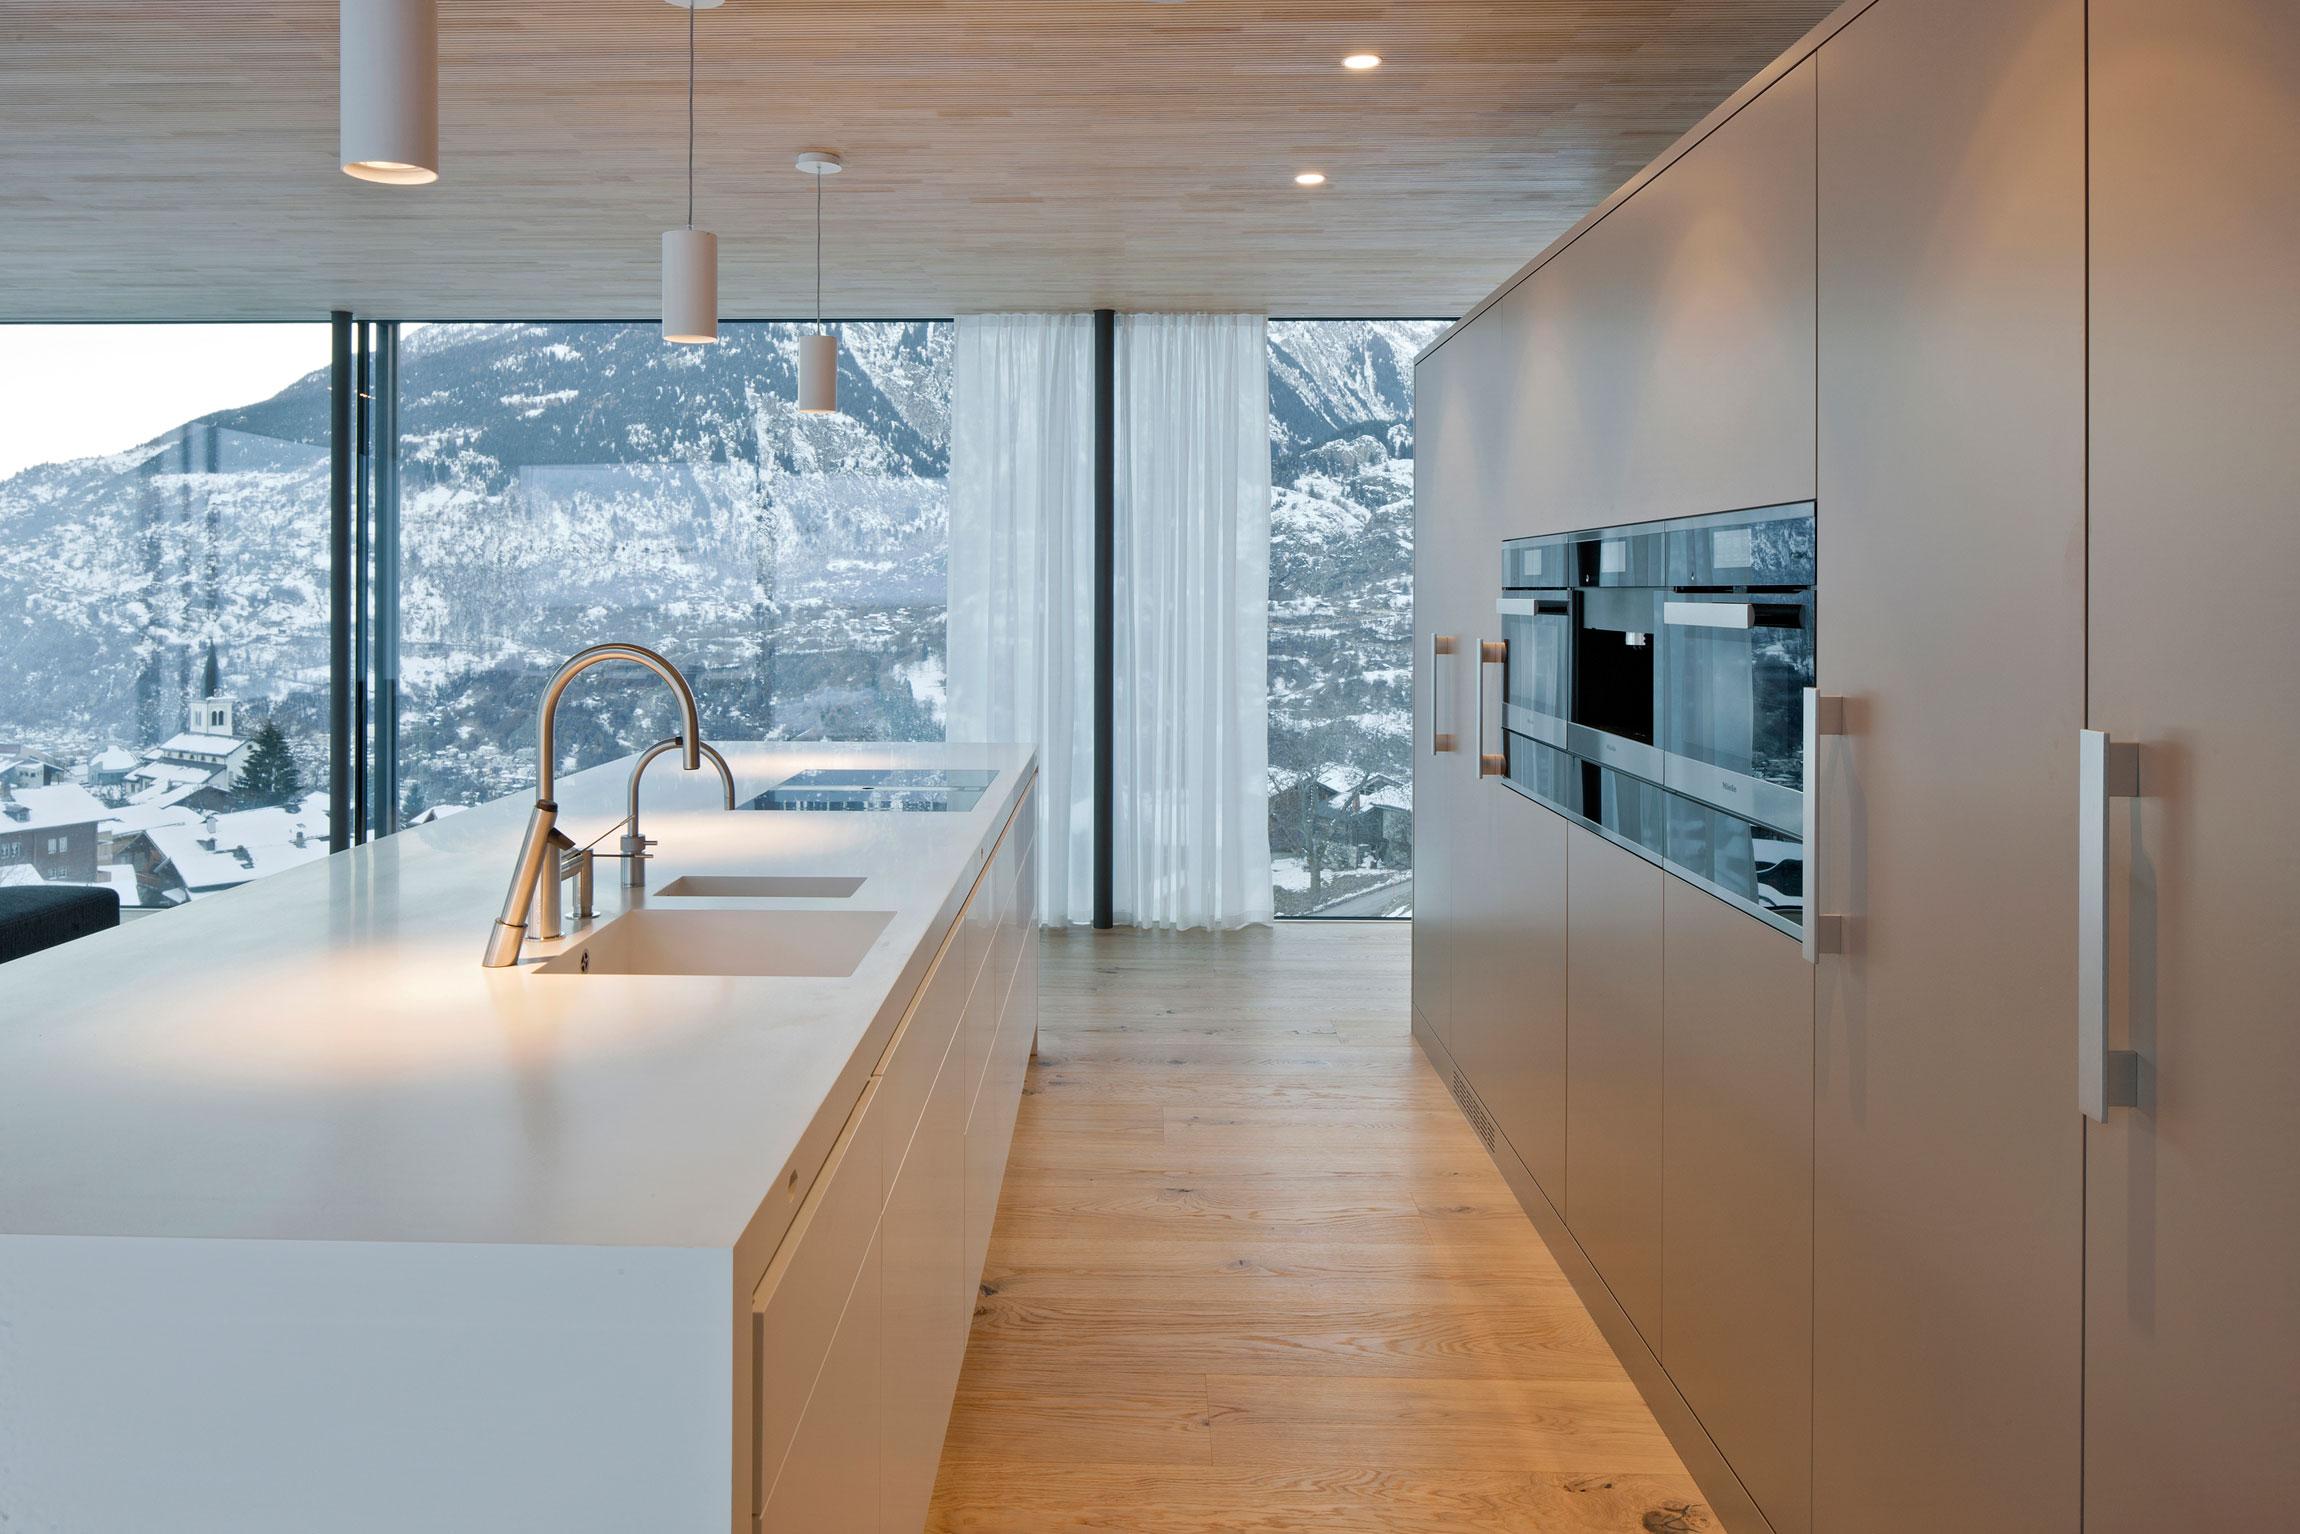 A HI-MACS House In Termen by Zeiter Berchtold-07